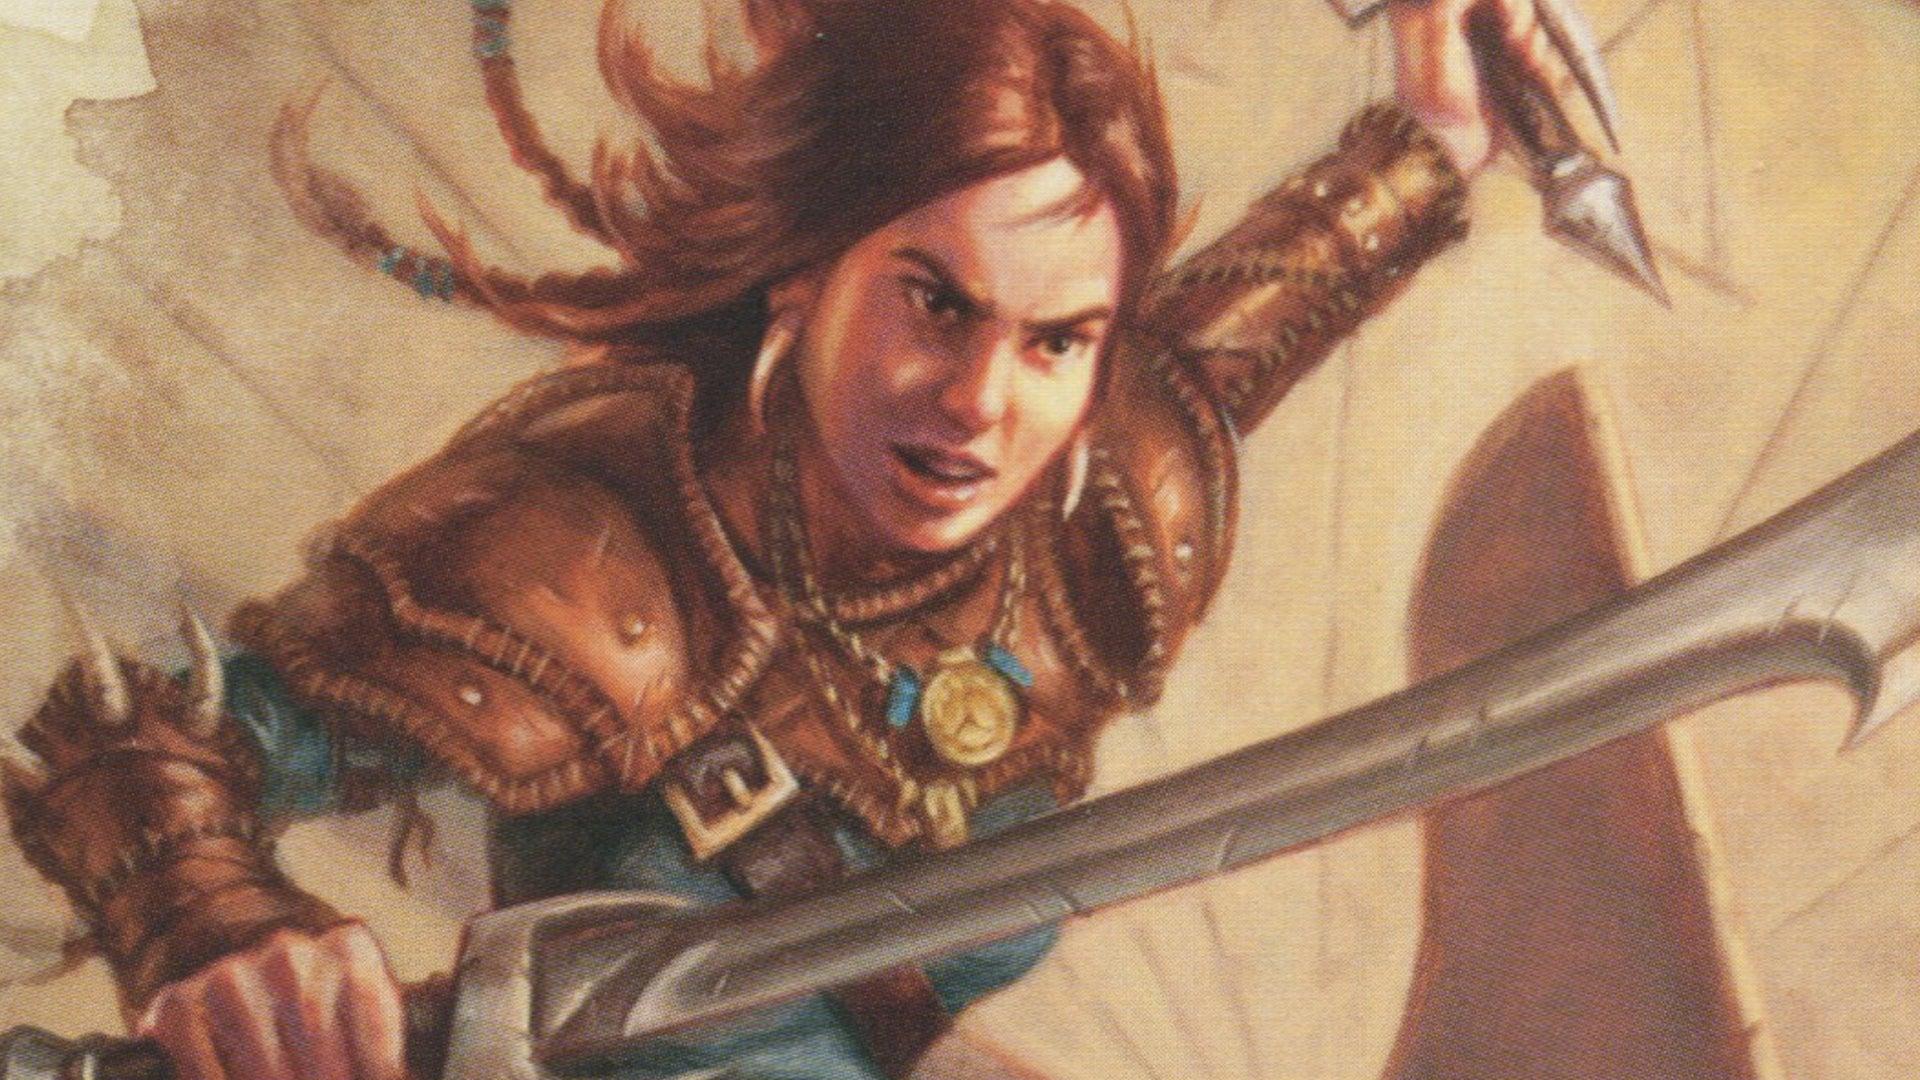 Dungeons & Dragons 5e Players Handbook artwork 25